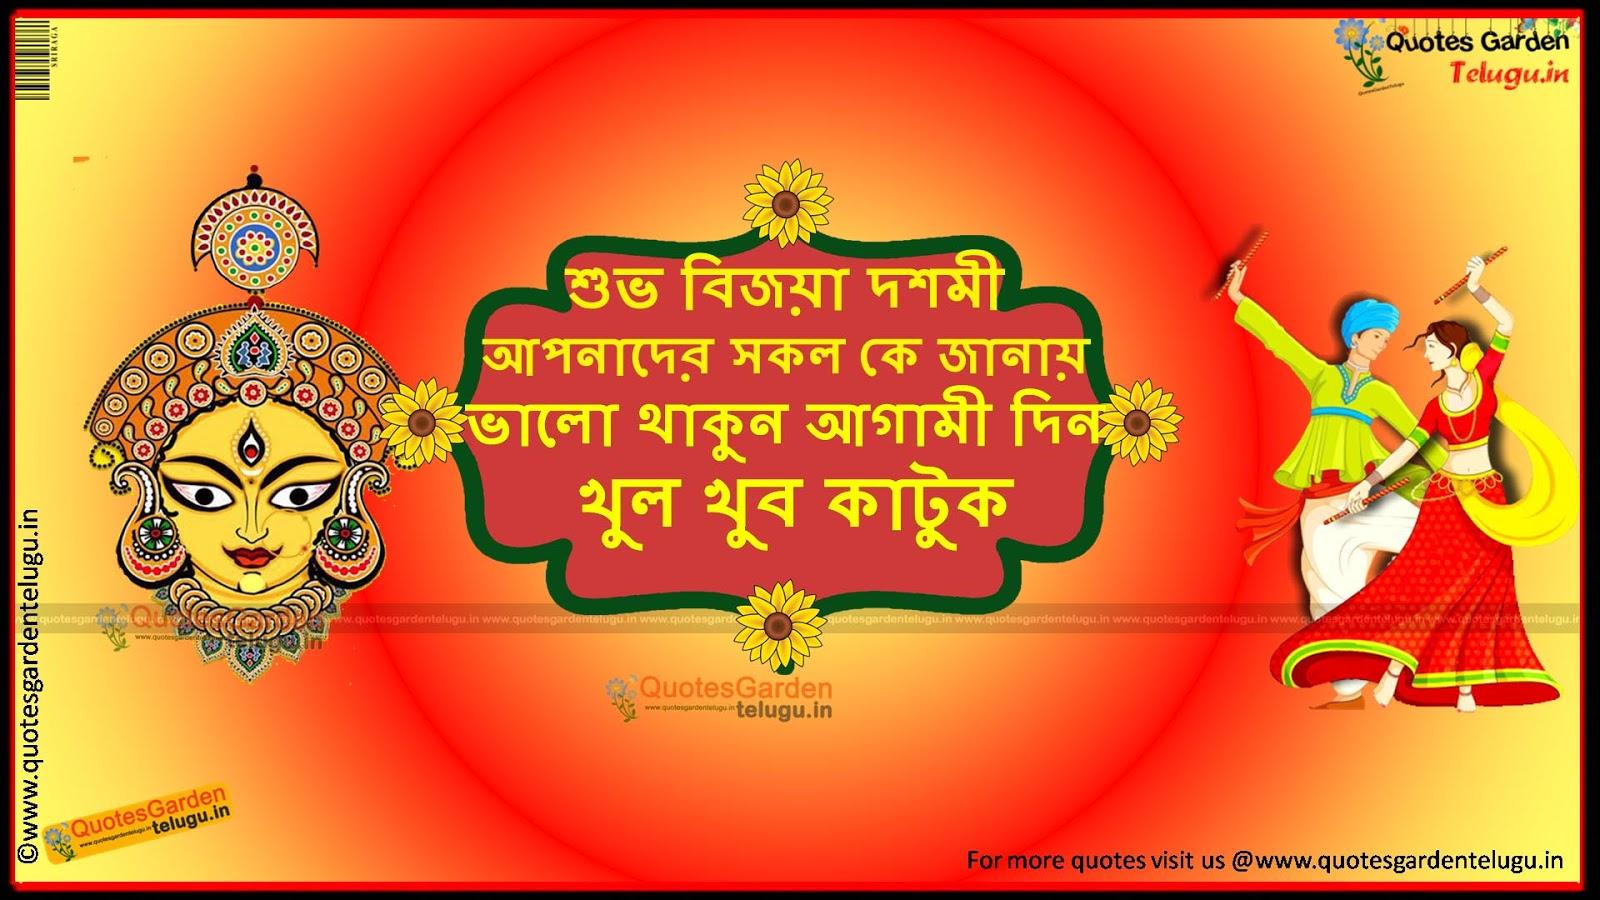 Bangla Durga Puja Image 2 Quotes